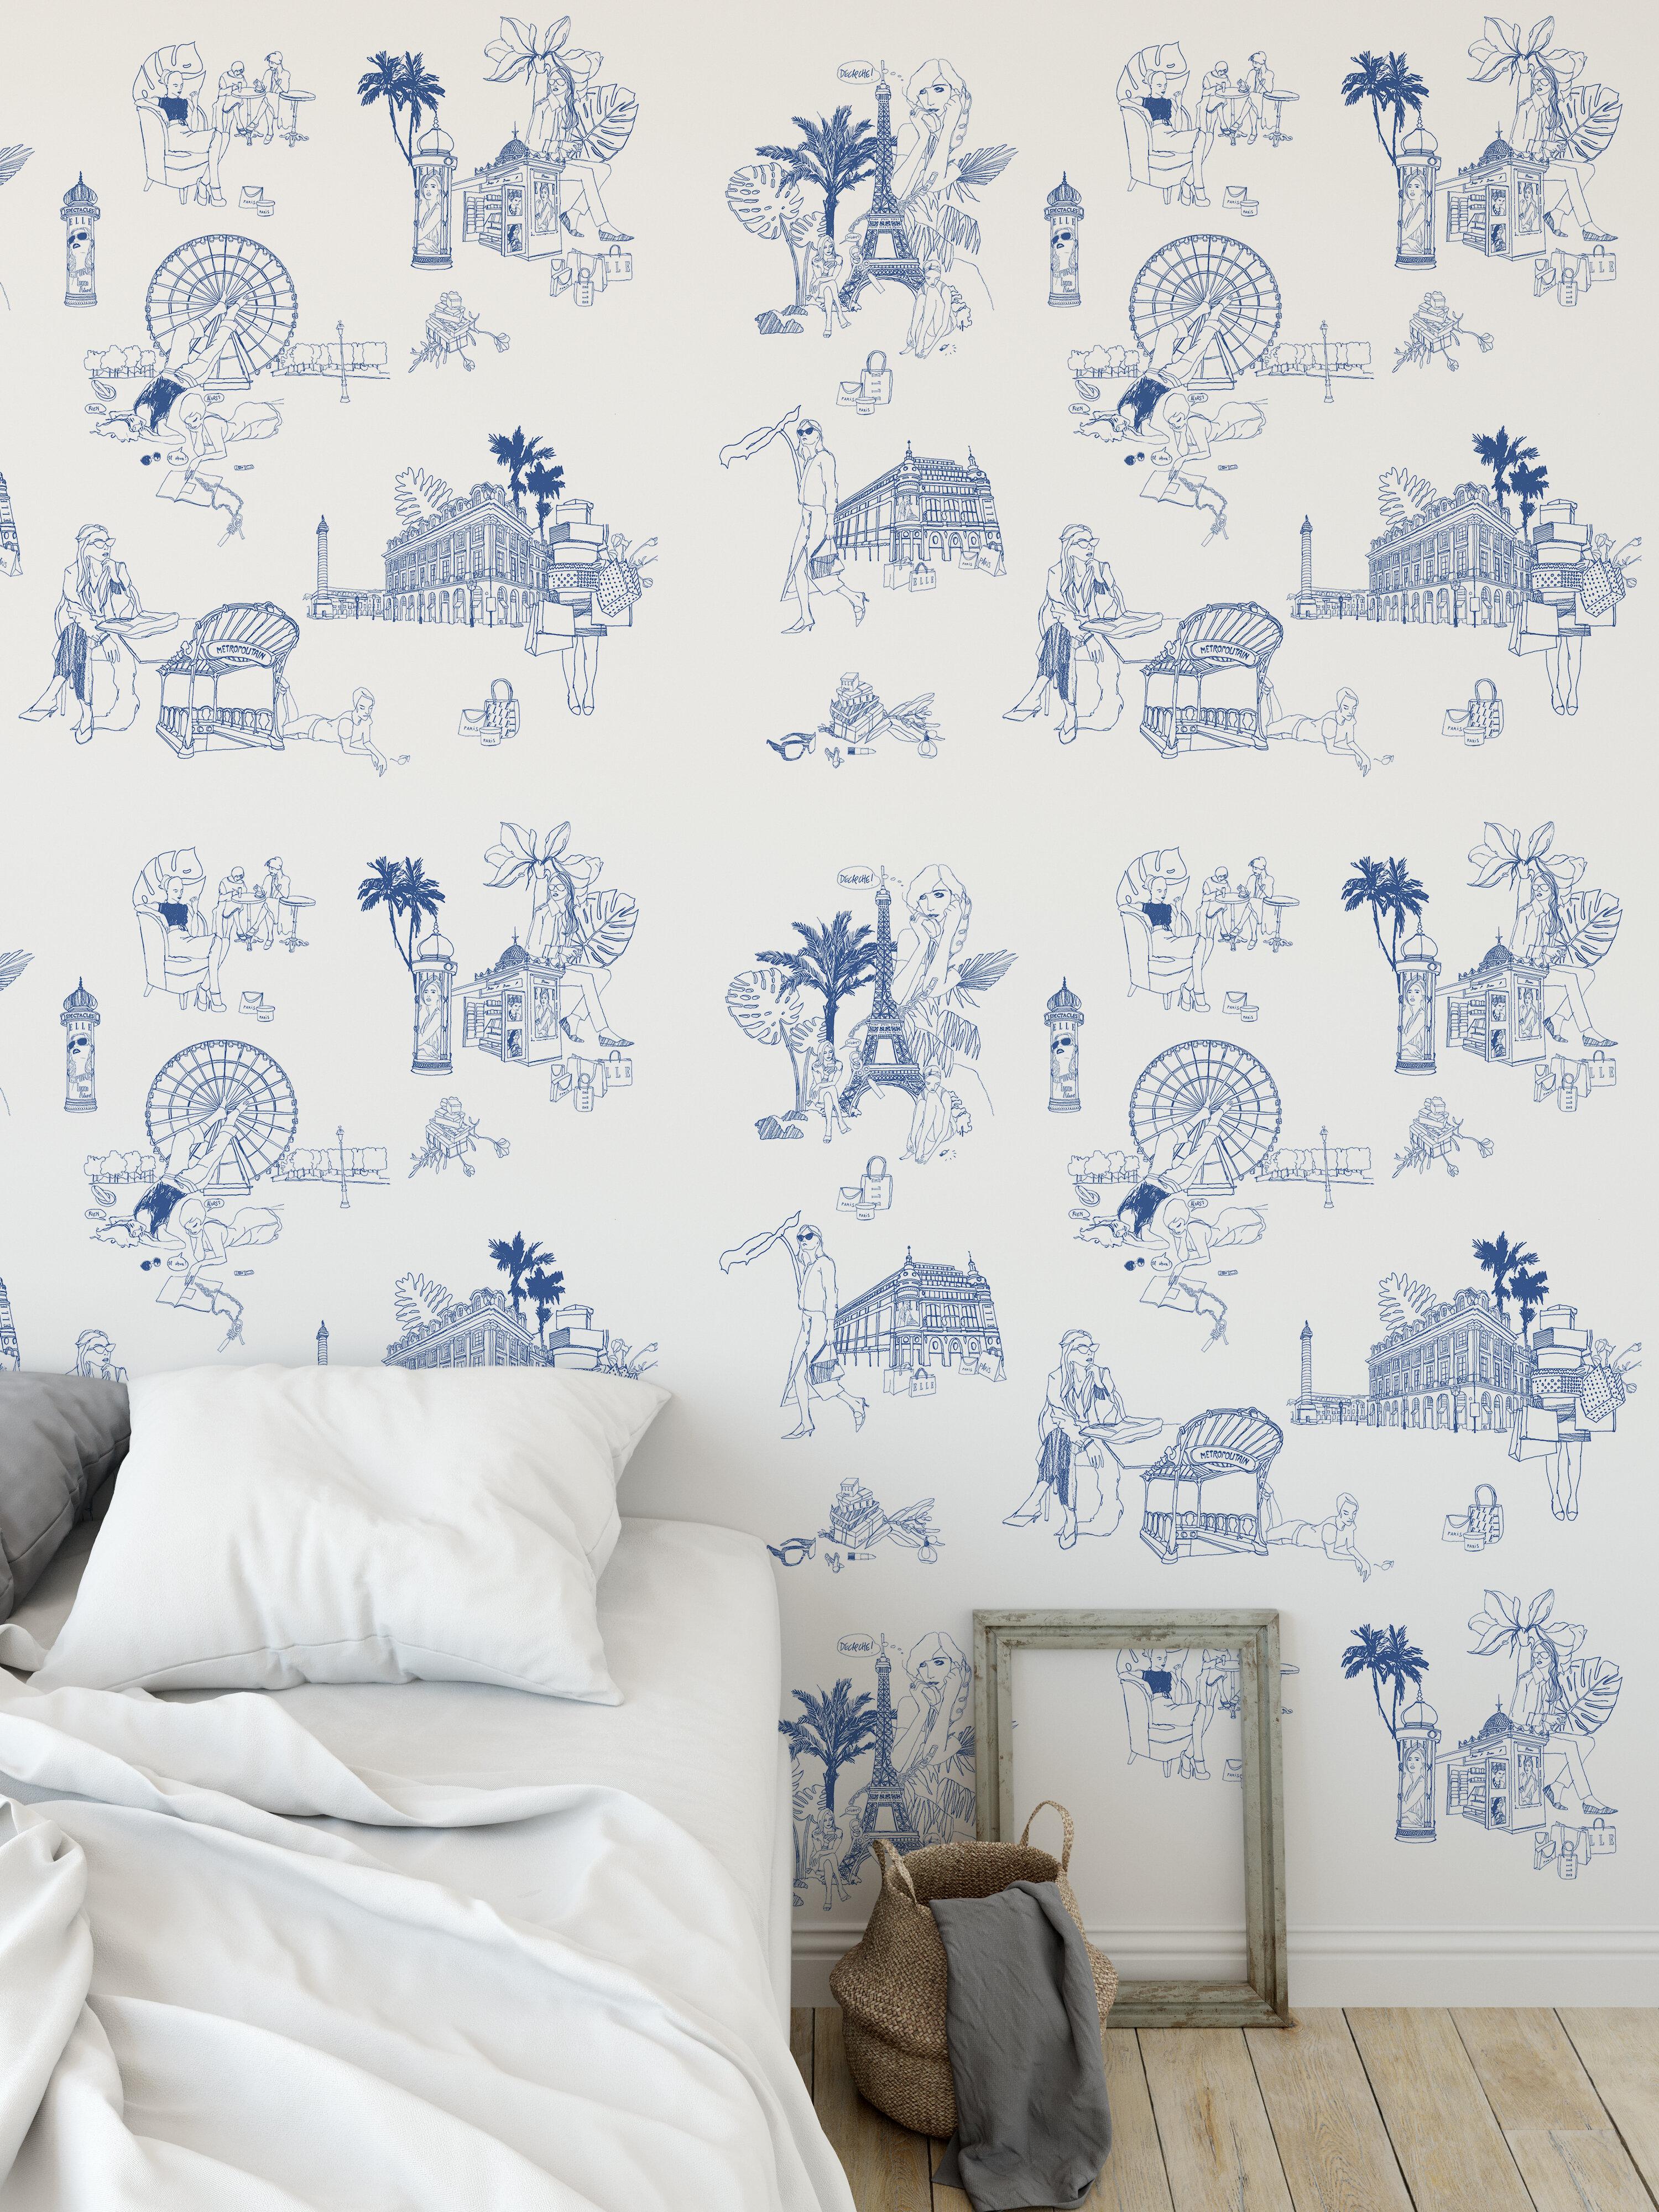 Sheers Tiny Toile de jouy Dollhouse Curtains Blue /& Cream w// Cream Satiny Semi